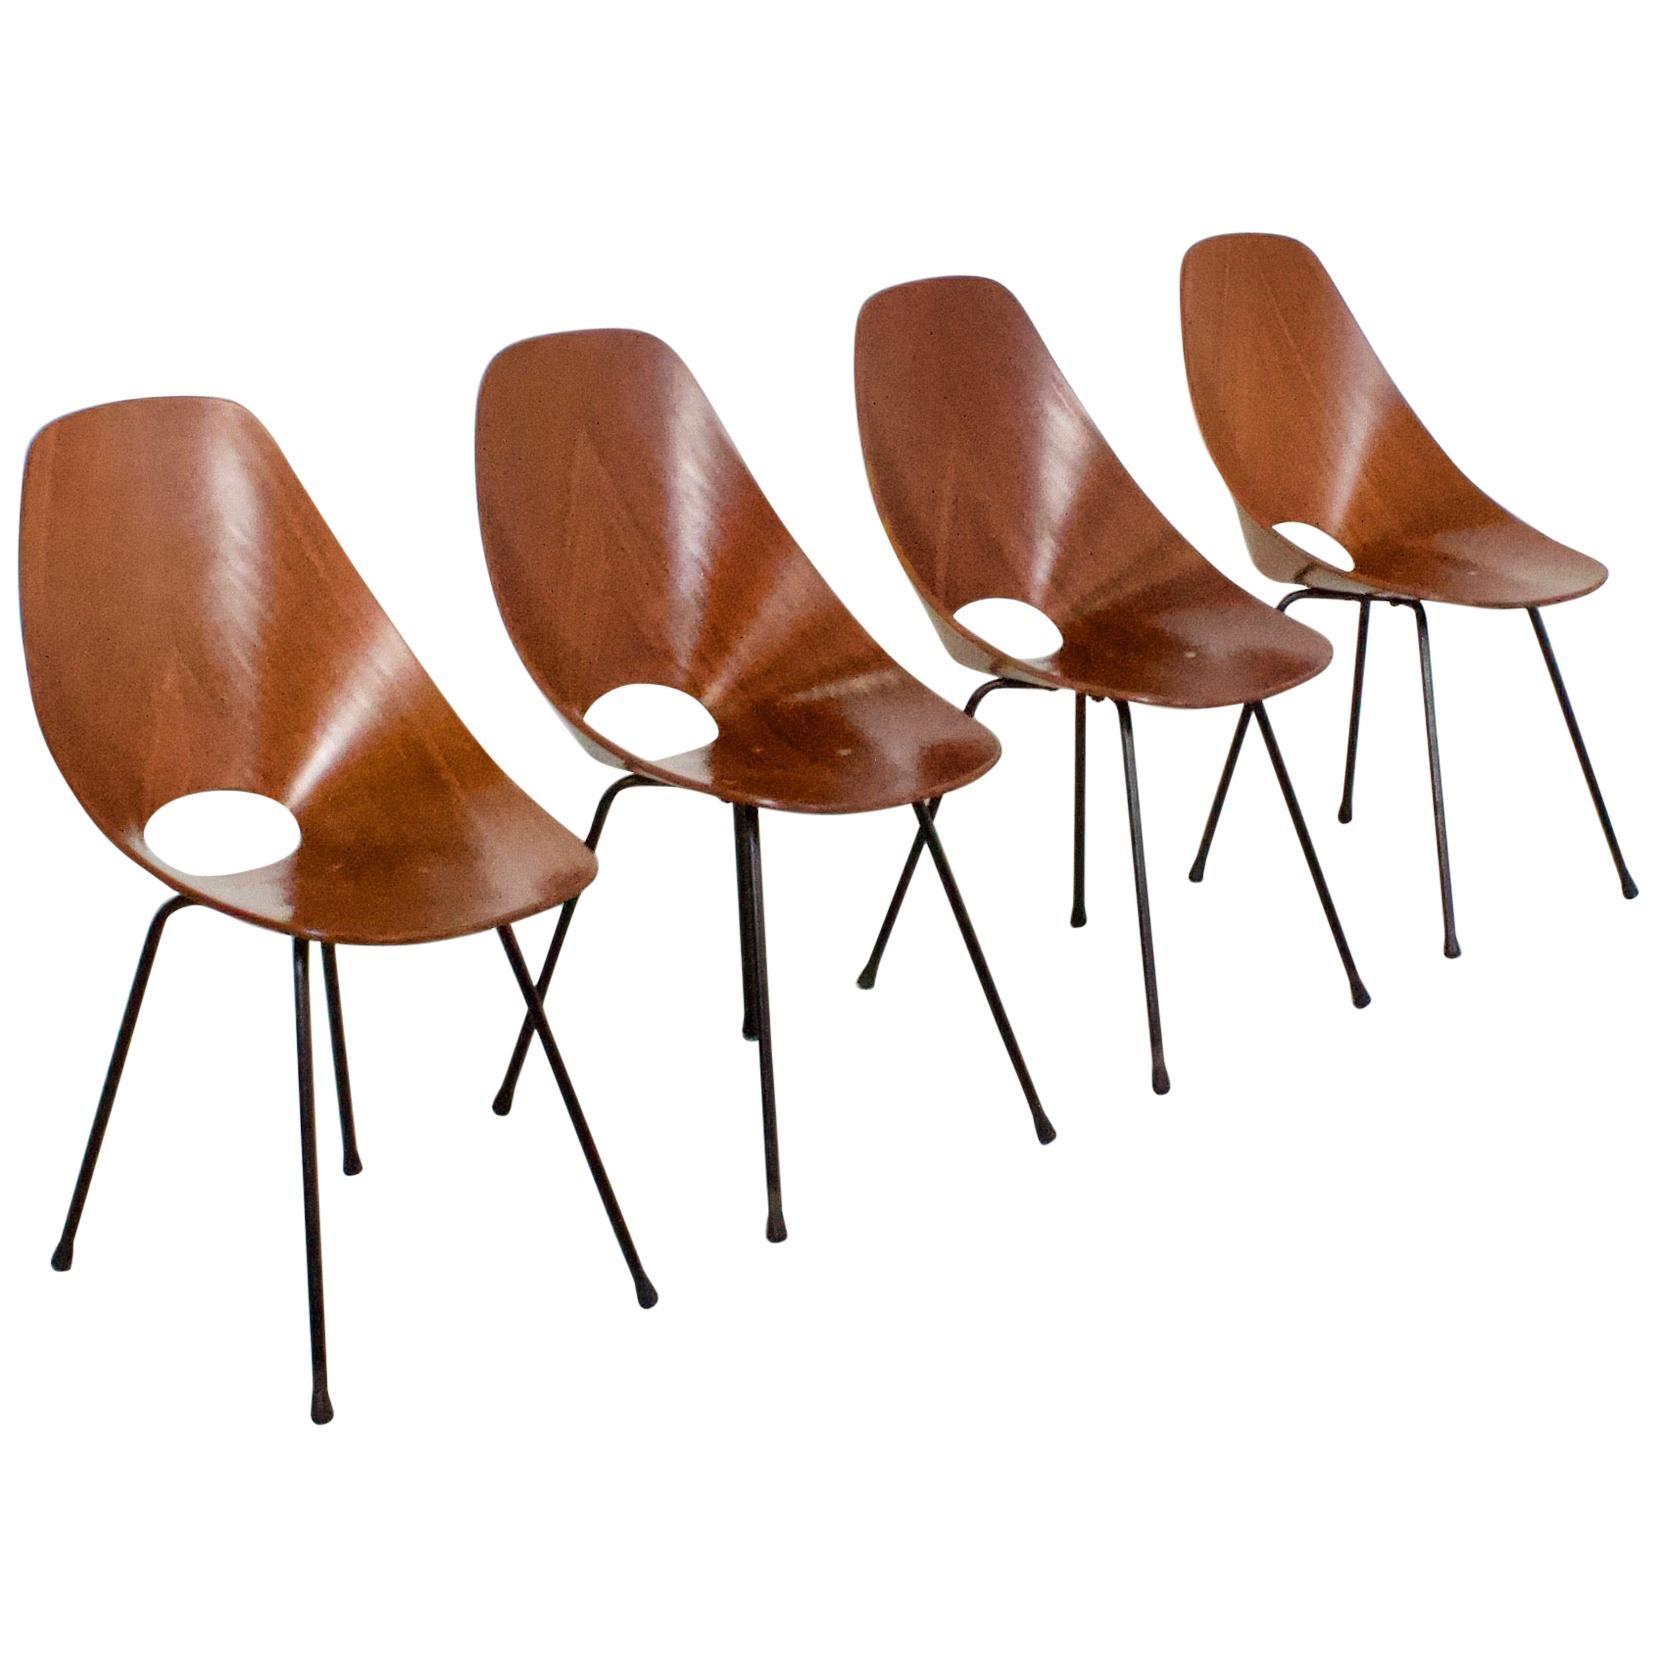 4 Plywood Vittorio Nobili 'Medea' Chairs, Italy, 1955